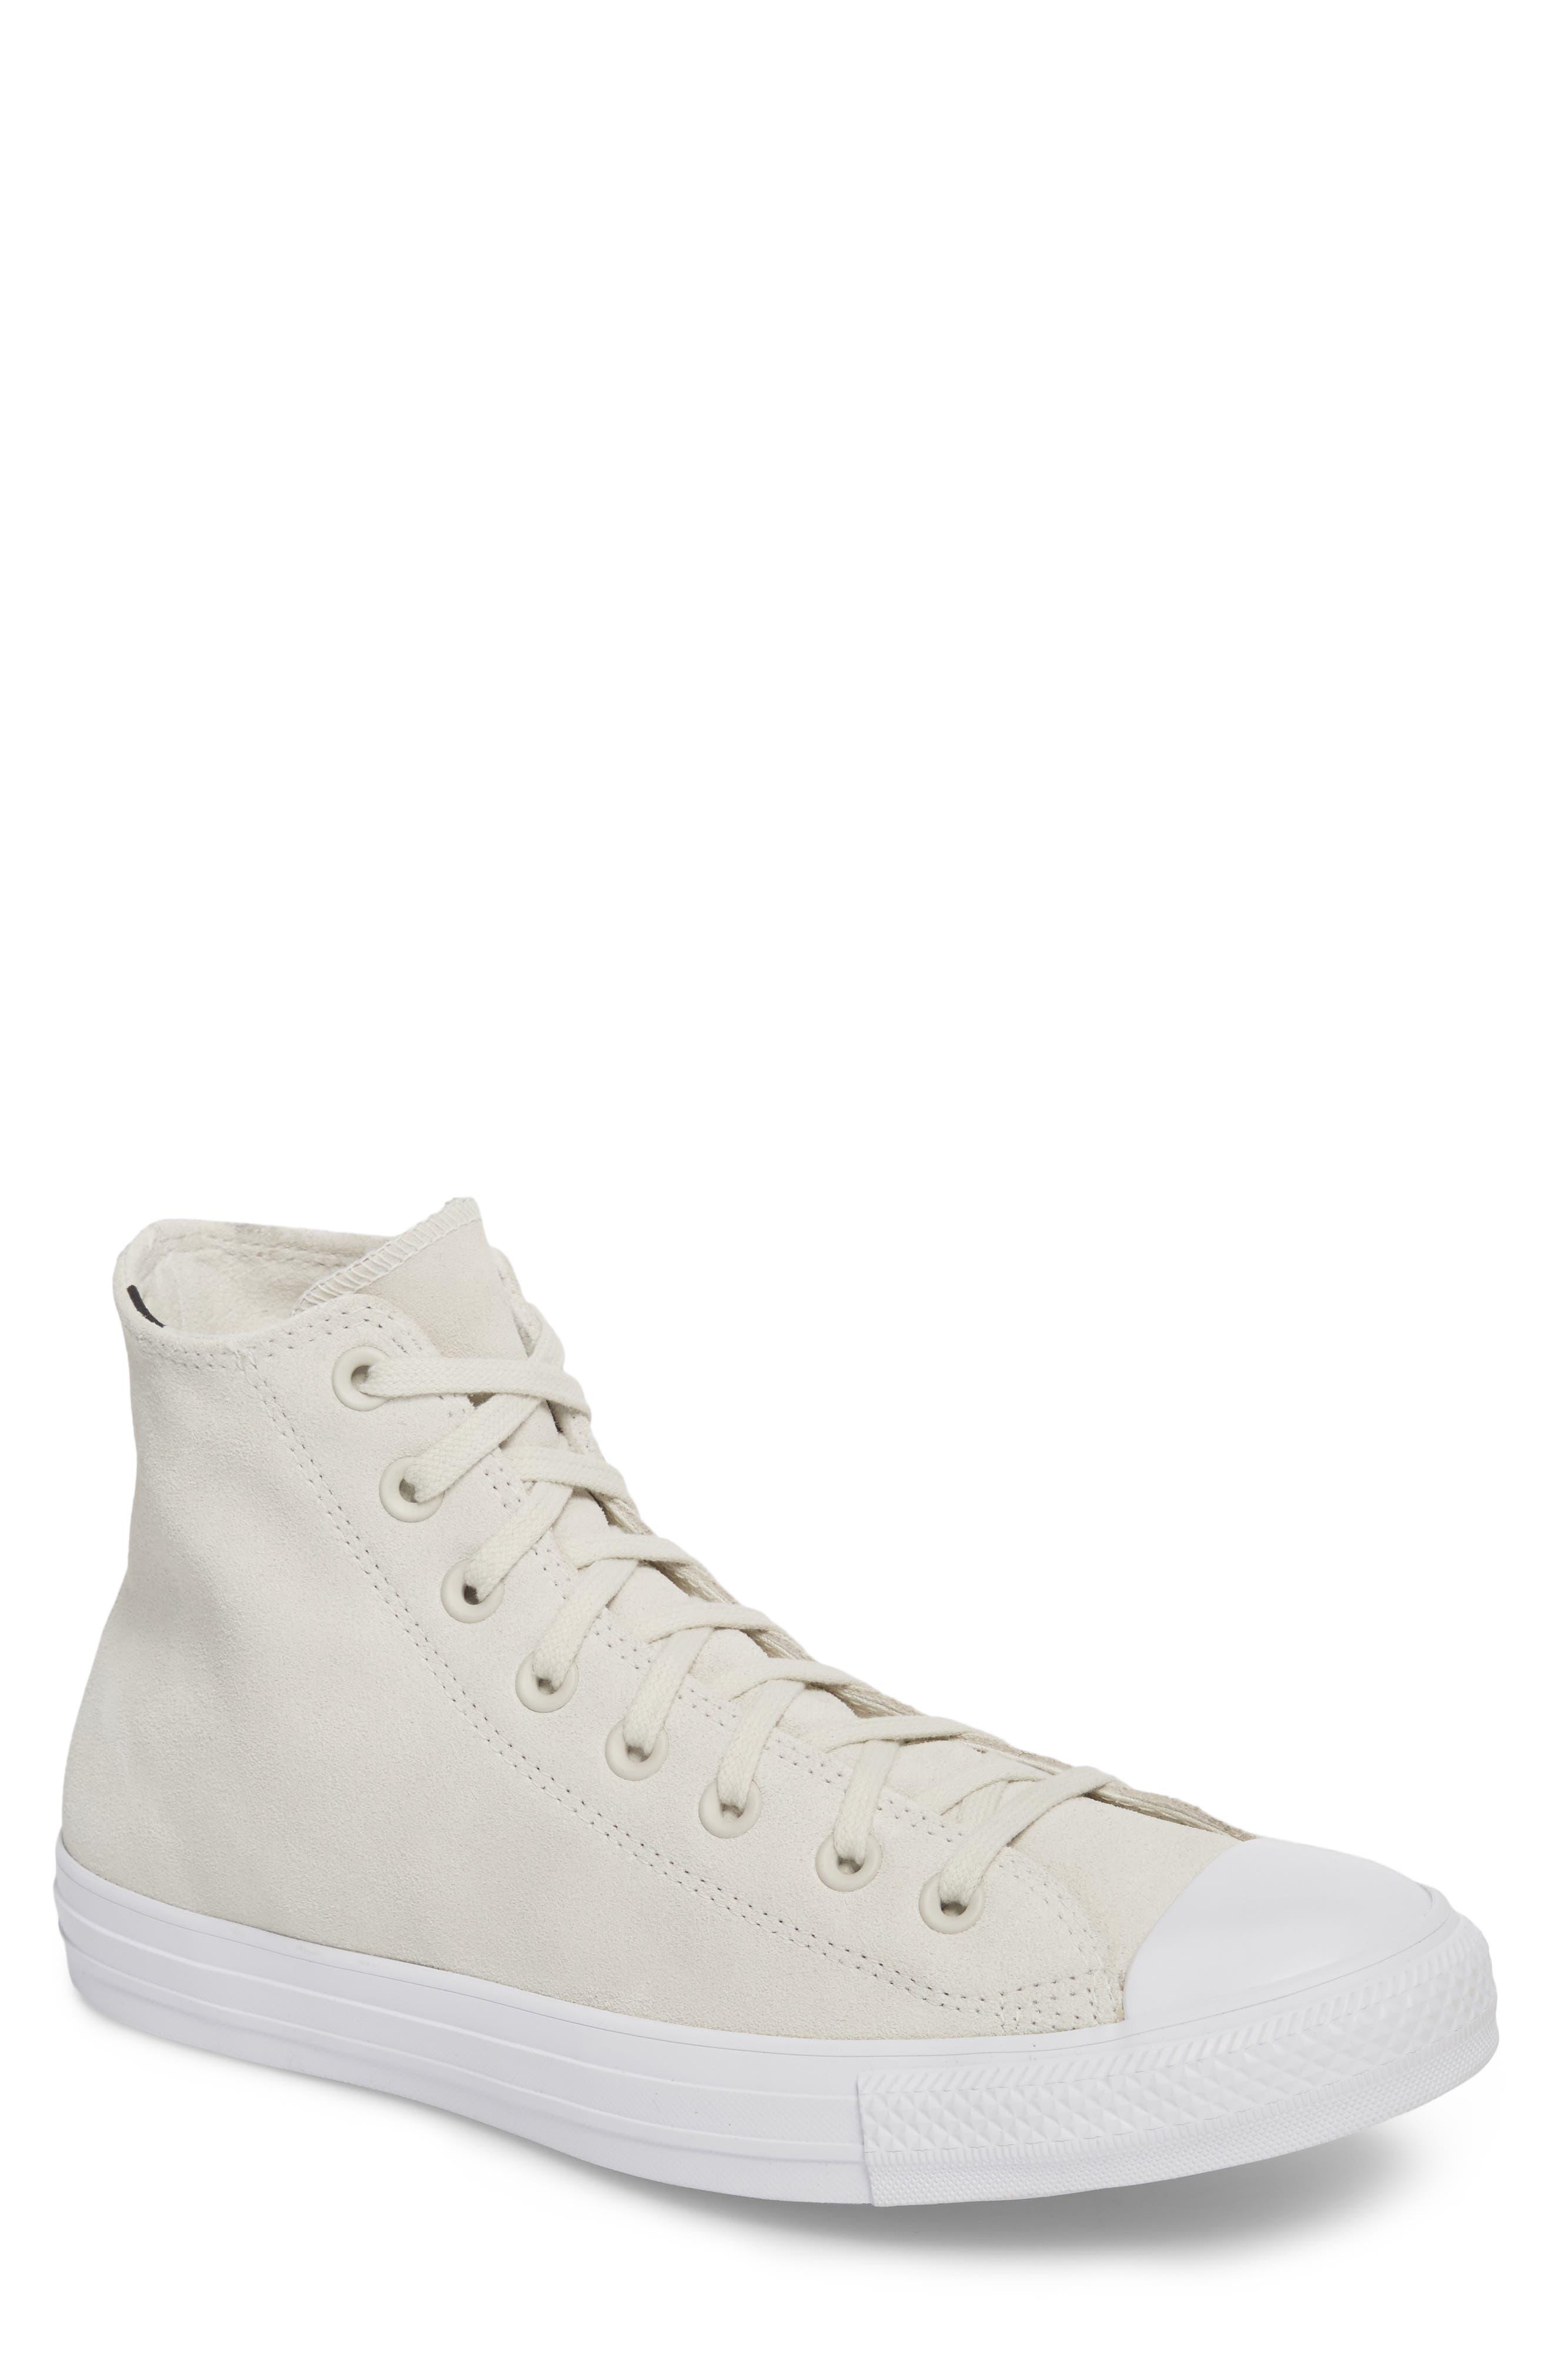 Chuck Taylor<sup>®</sup> All Star<sup>®</sup> Plush Hi Sneaker,                             Main thumbnail 1, color,                             Buff Suede